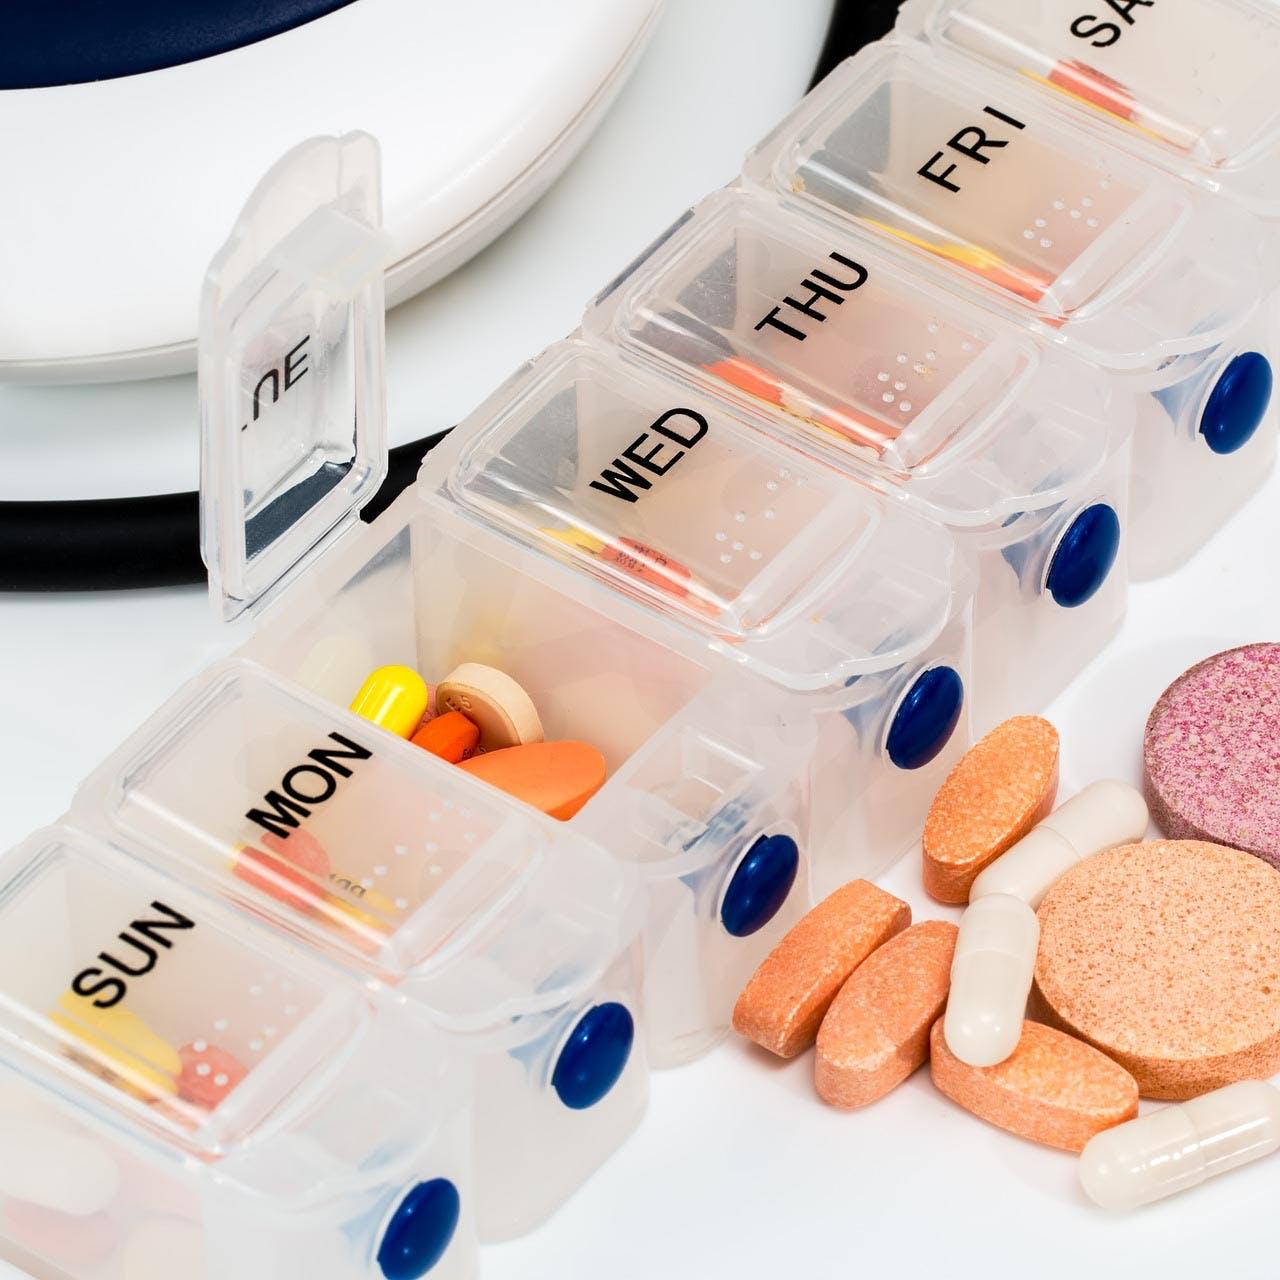 Pill,Product,Medicine,Pharmaceutical drug,Pill organizer,Material property,Capsule,Prescription drug,Plastic,Health care